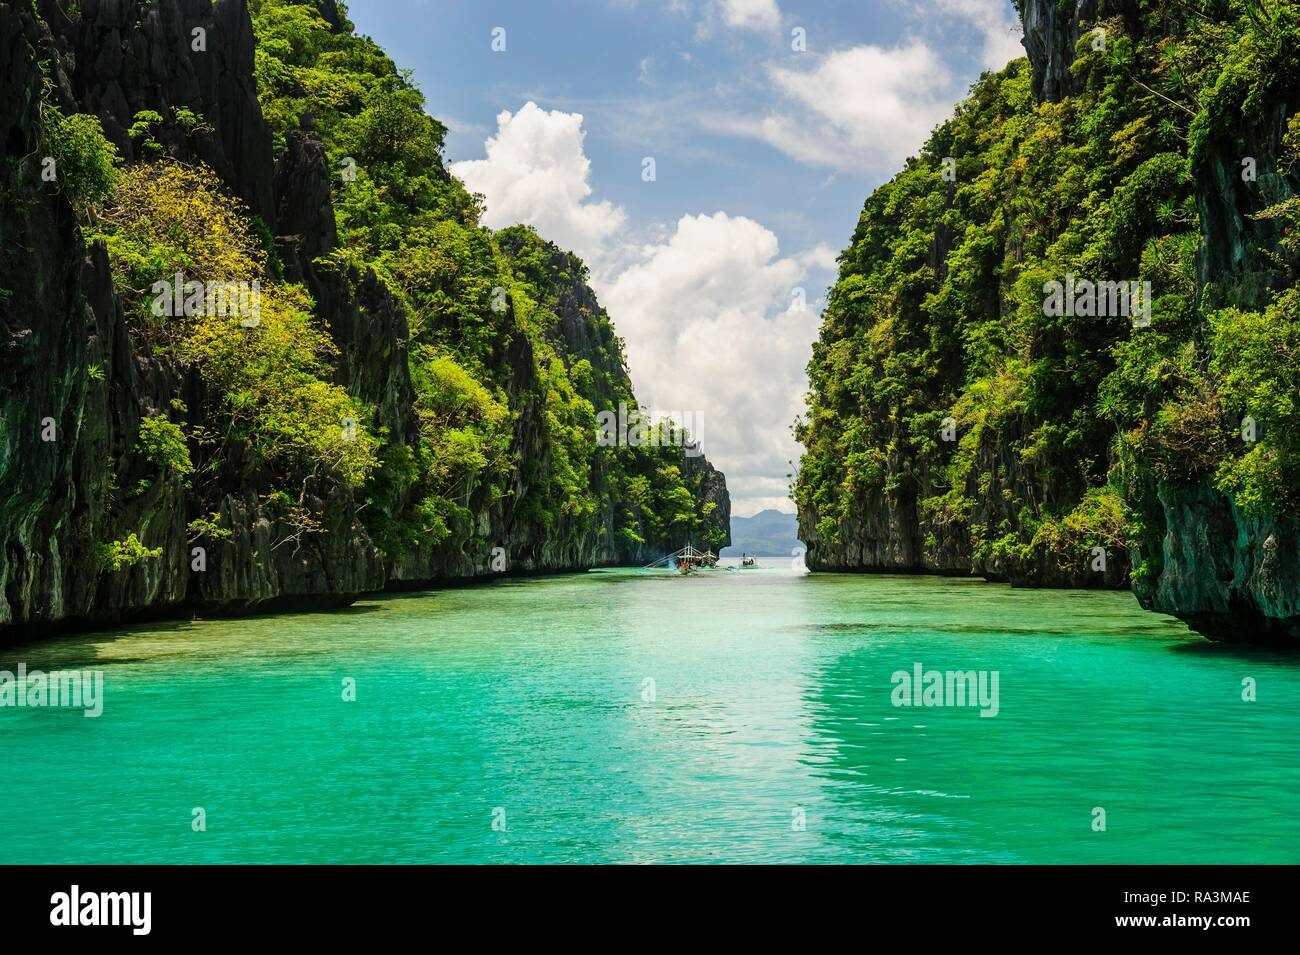 El agua cristalina entre las calizas en el archipiélago de Bacuit, Palawan, Filipinas Foto de stock